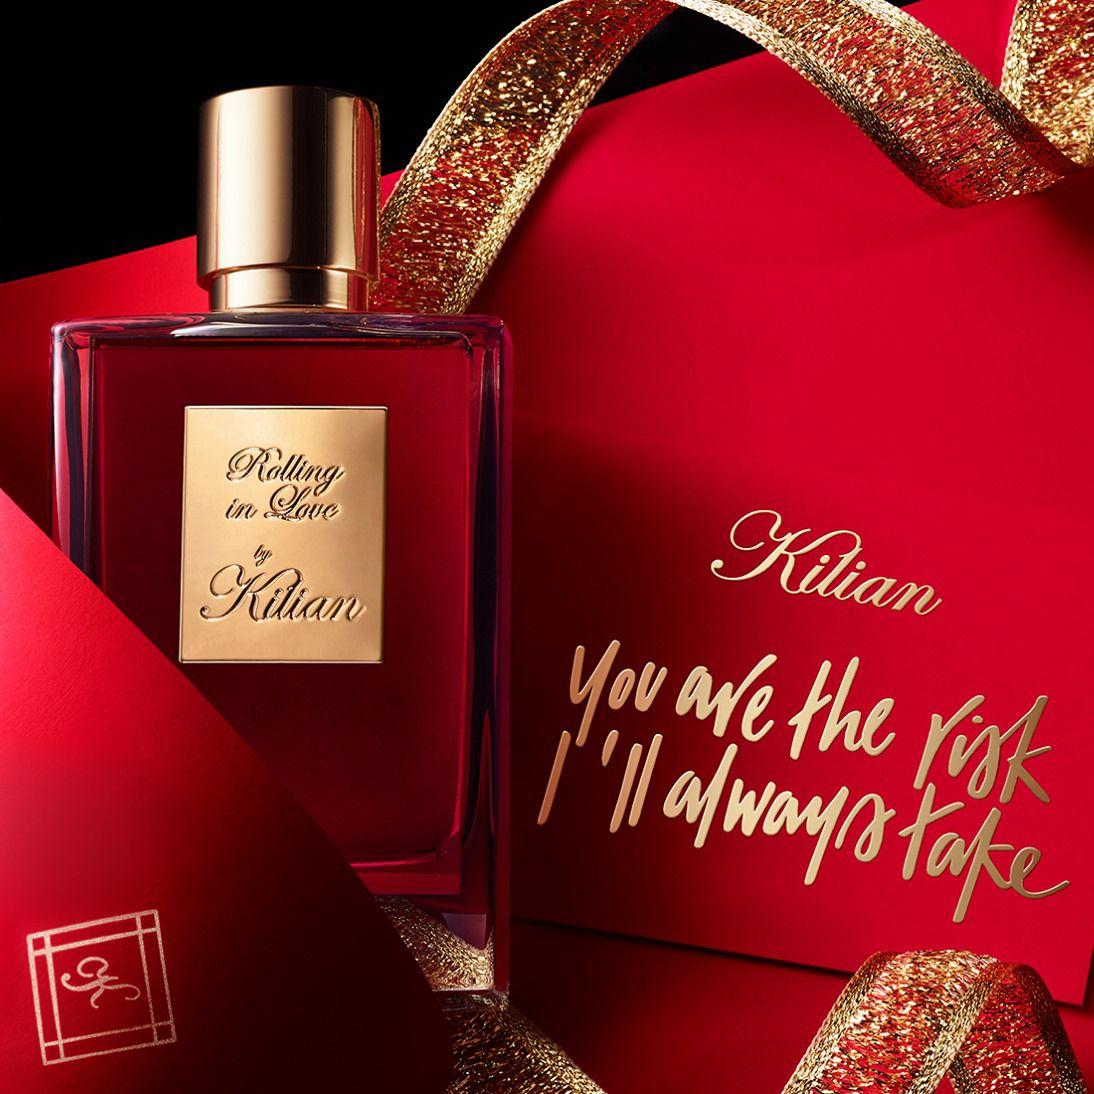 Kilian Rolling in Love 50 ml - Eau De Parfum #magariungiorno